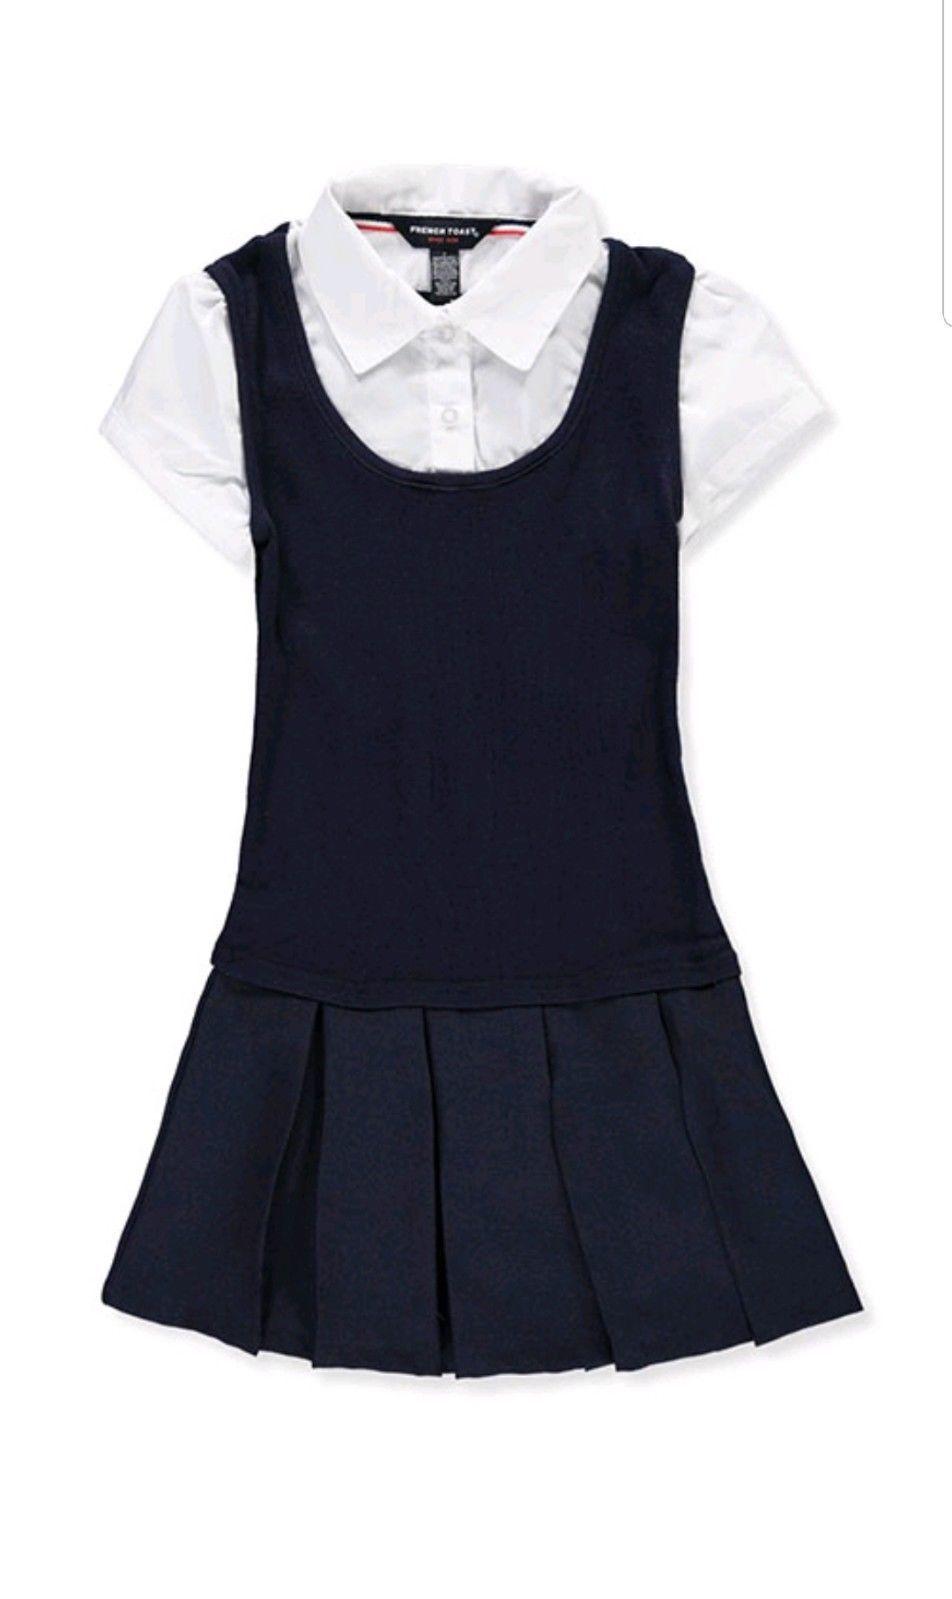 girls gabrielle jumper twofer uniform navy blue